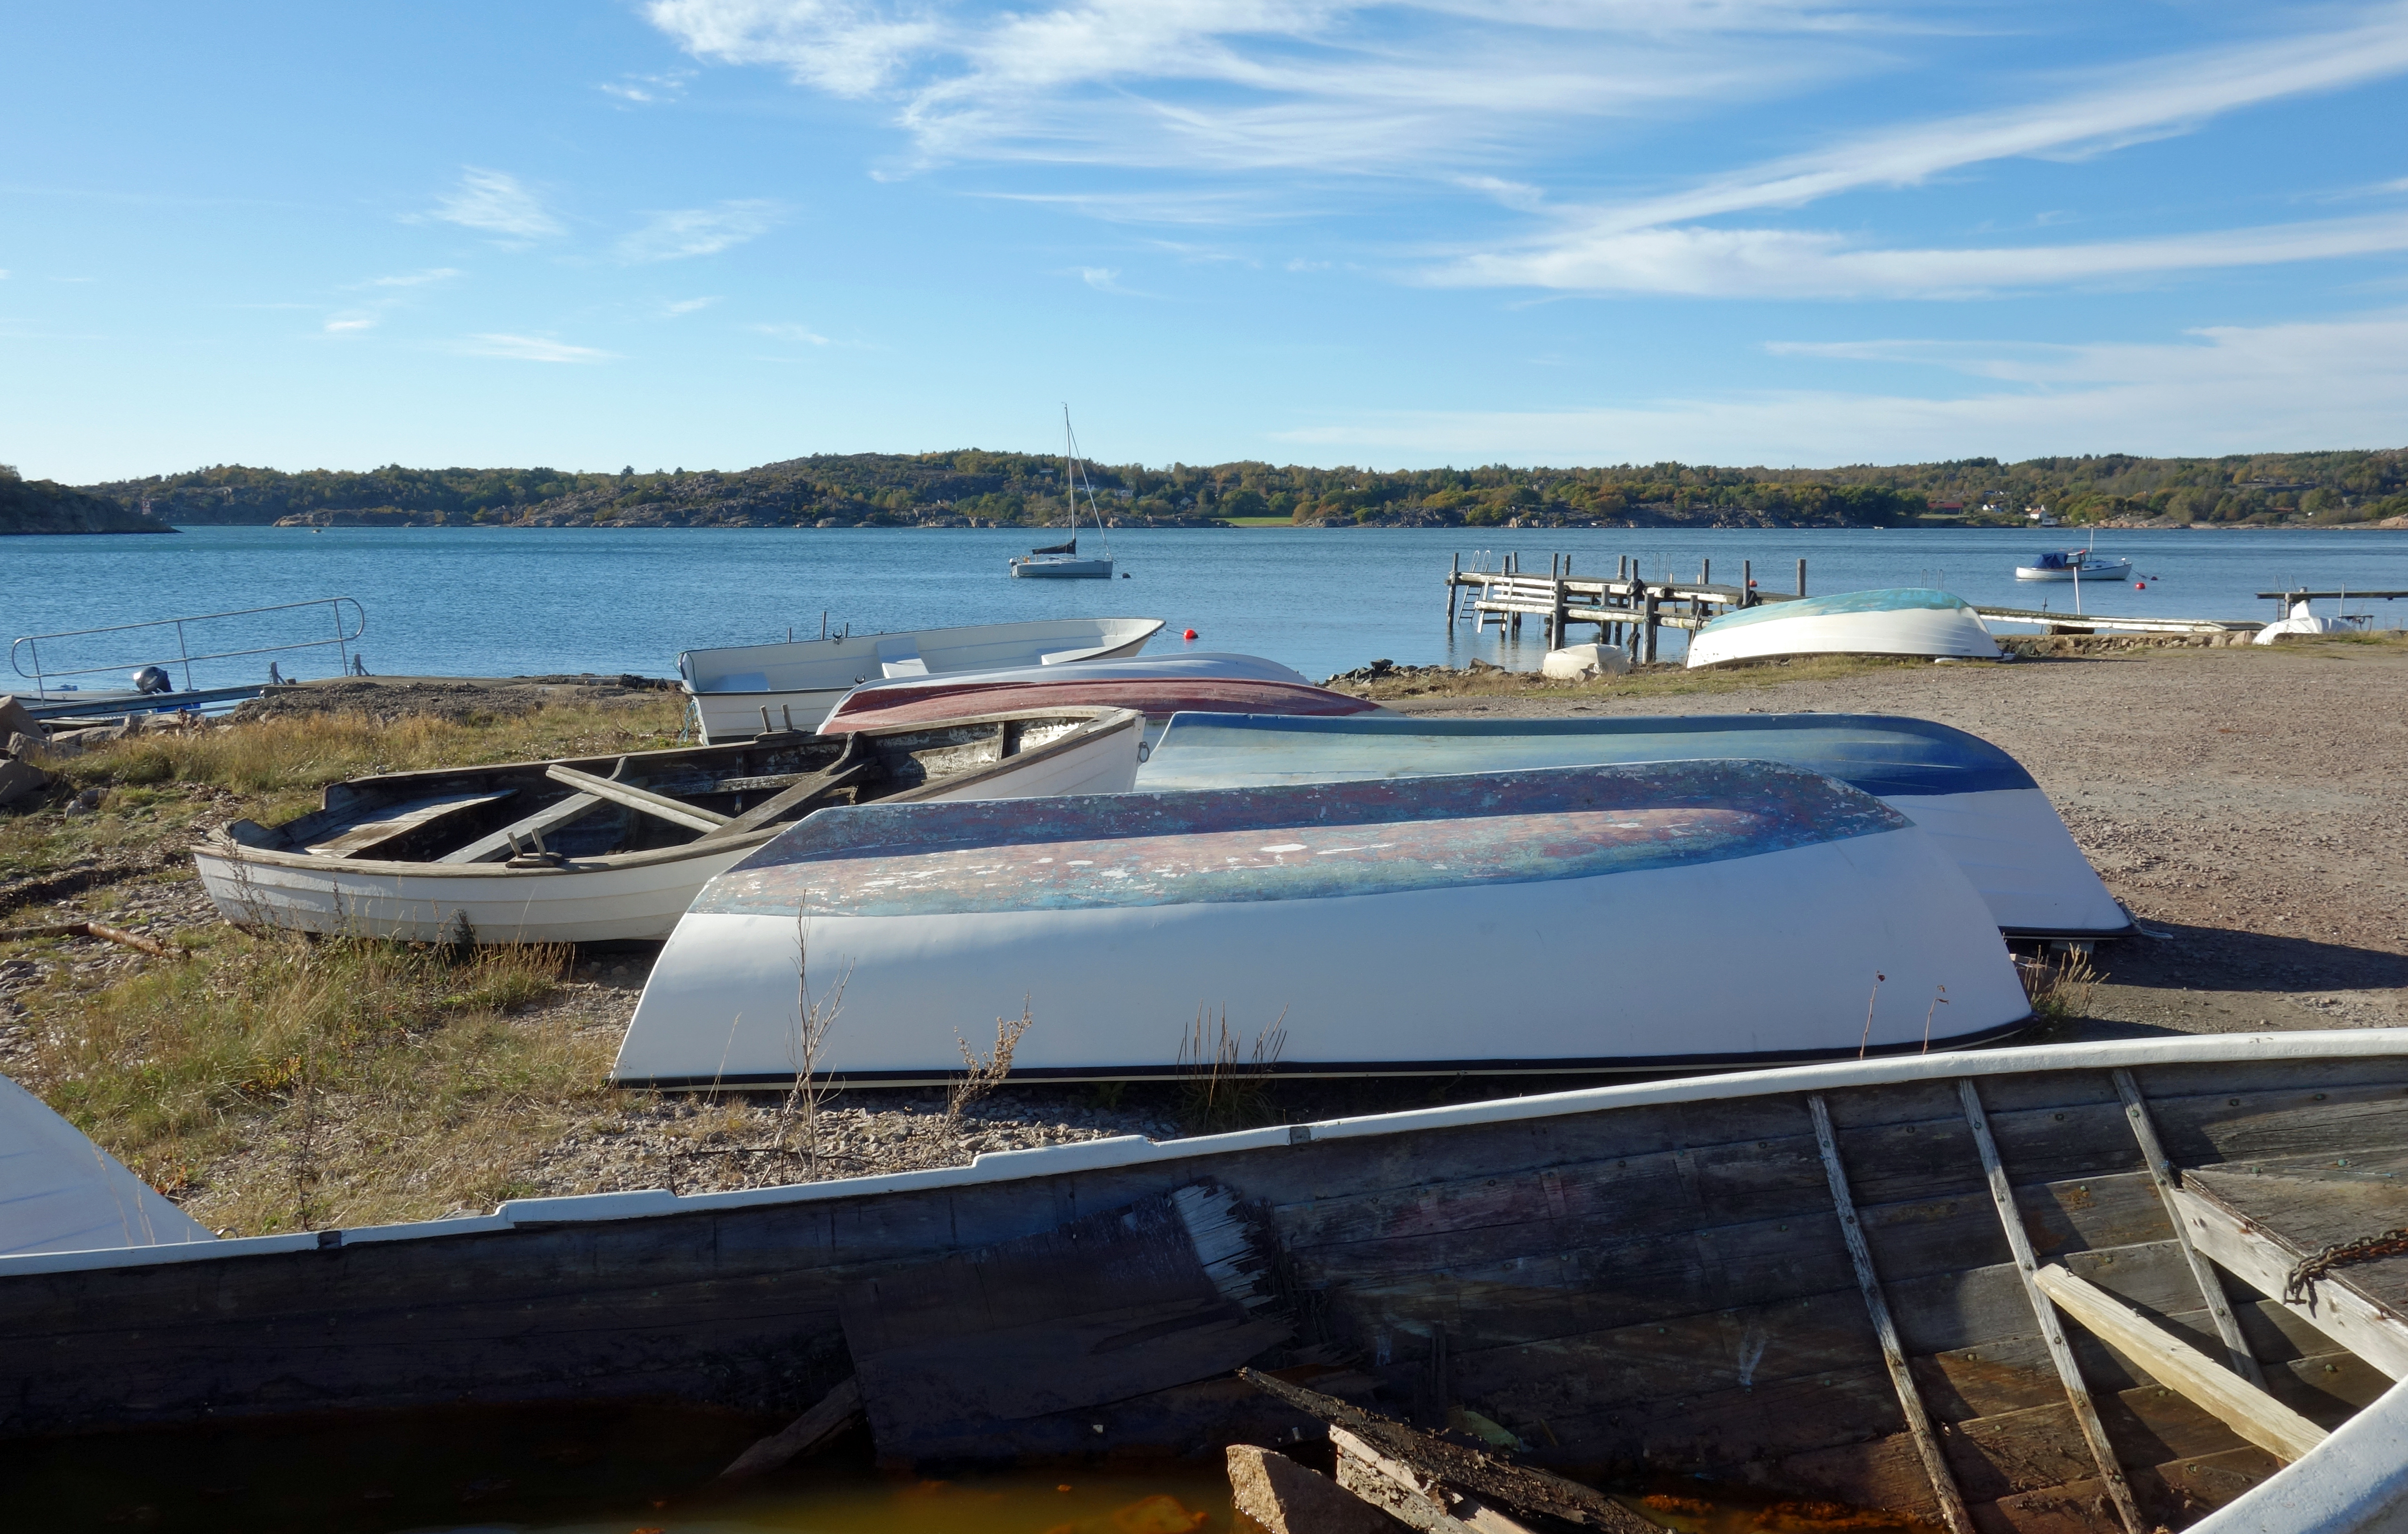 File:Small boats on land at Holländaröd.jpg - Wikimedia Commons